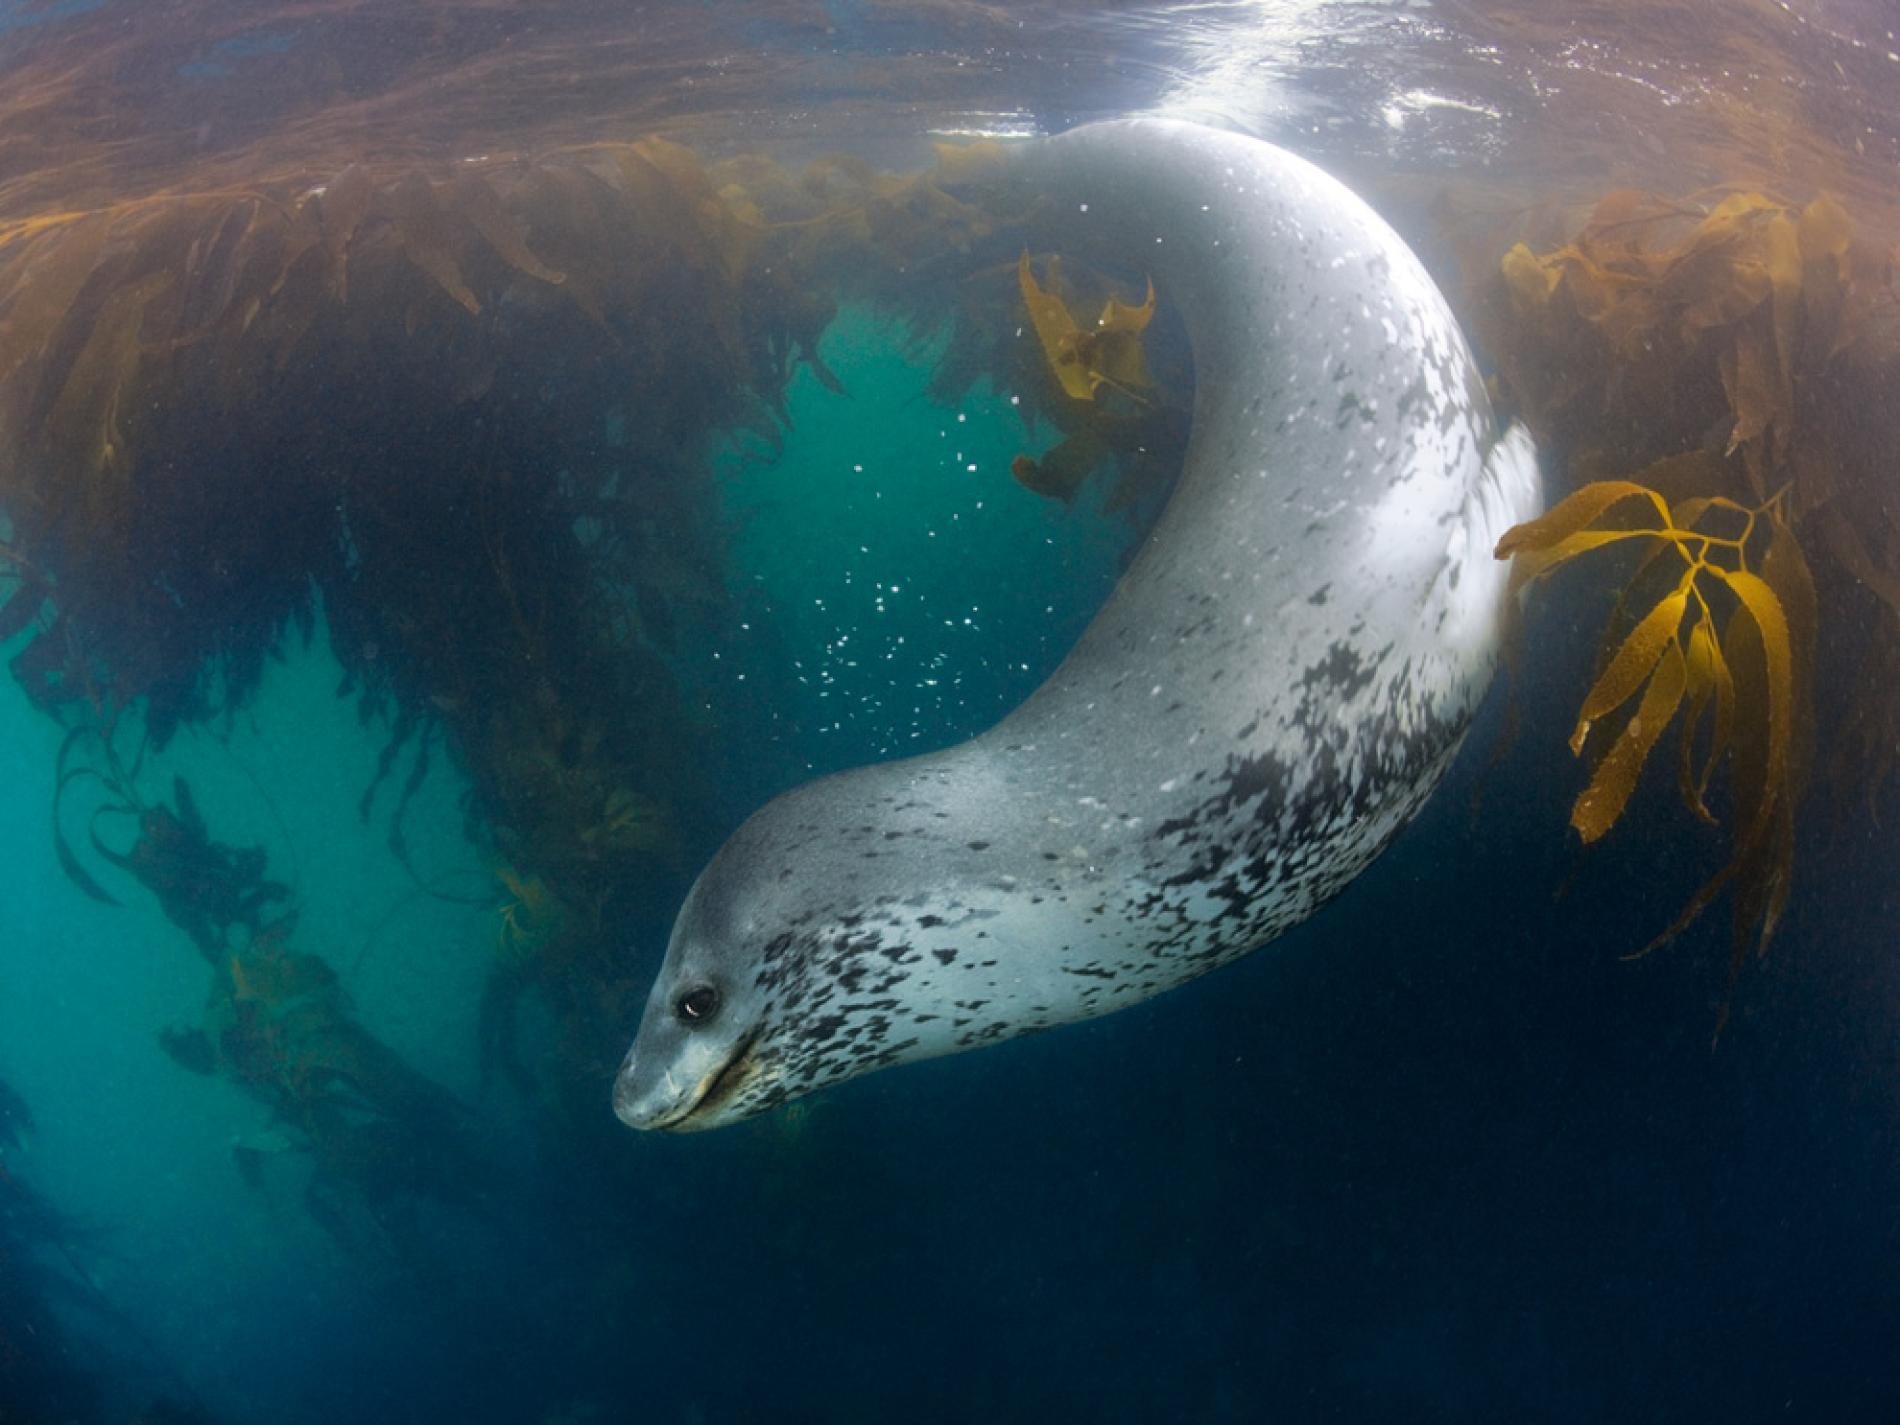 Морской леопард в воде